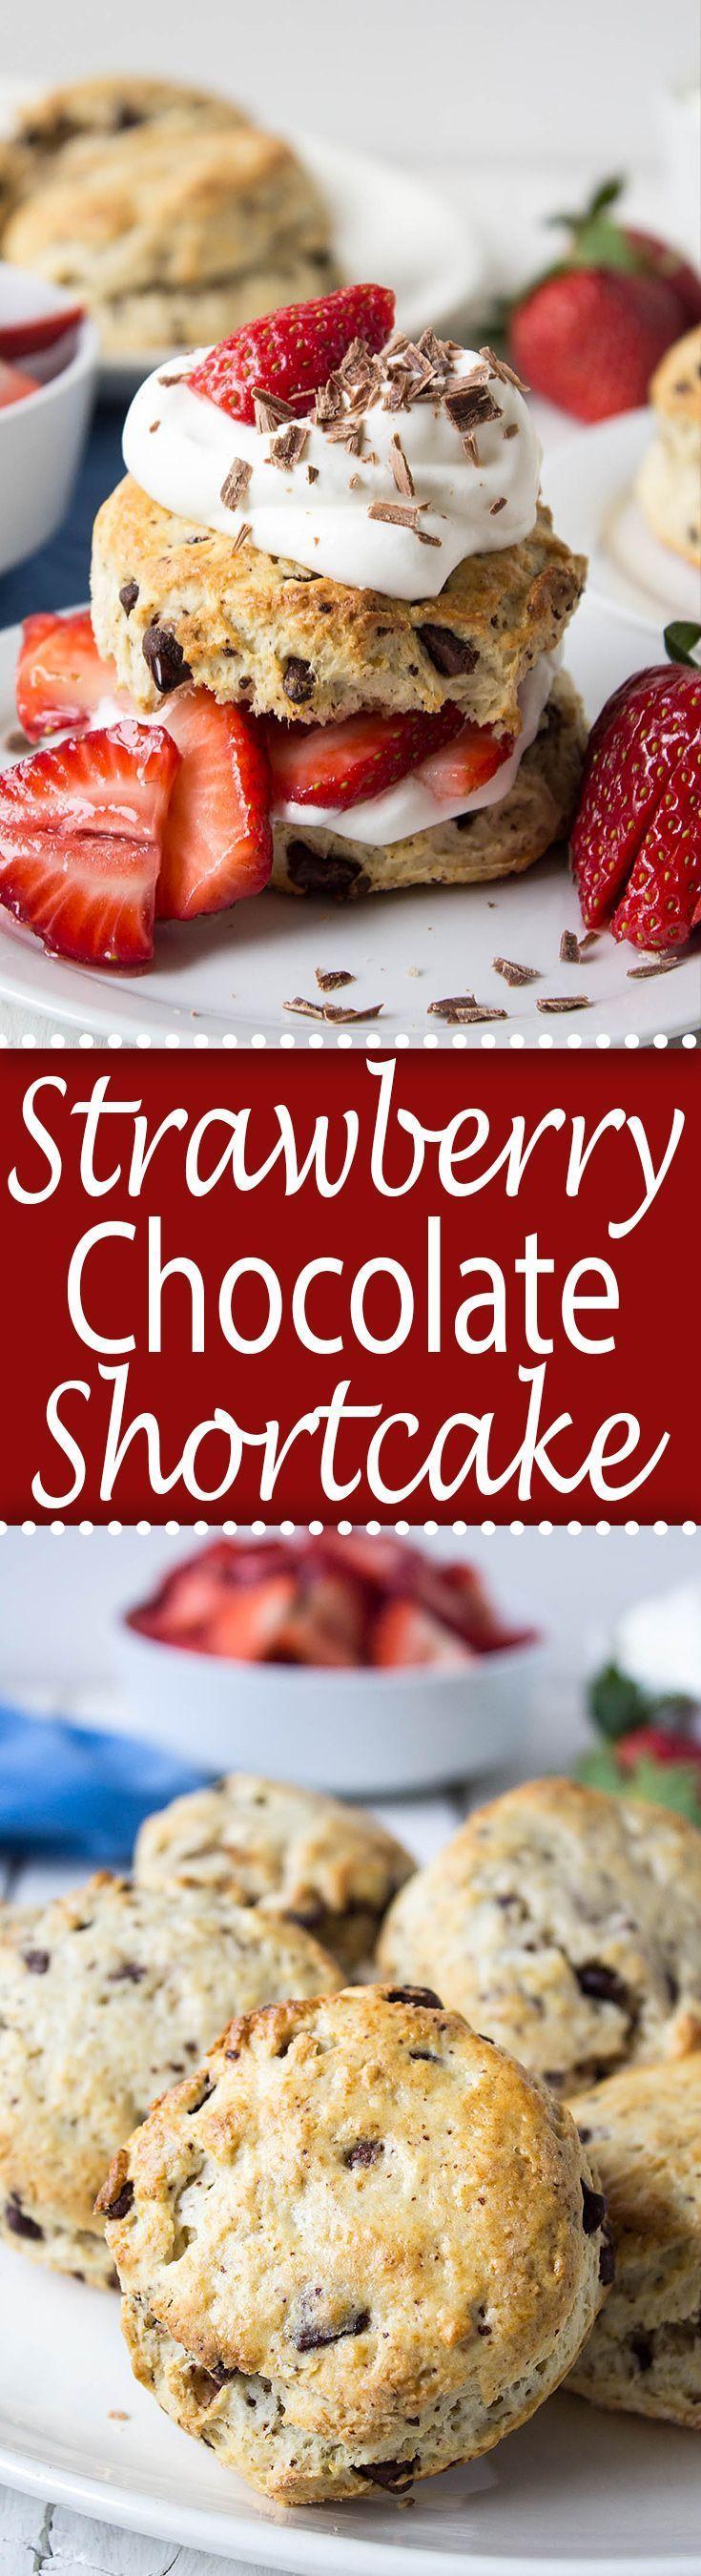 Fresh strawberries and chunks of chocolate make this Strawberry Chocolate Shortcake irresistible!